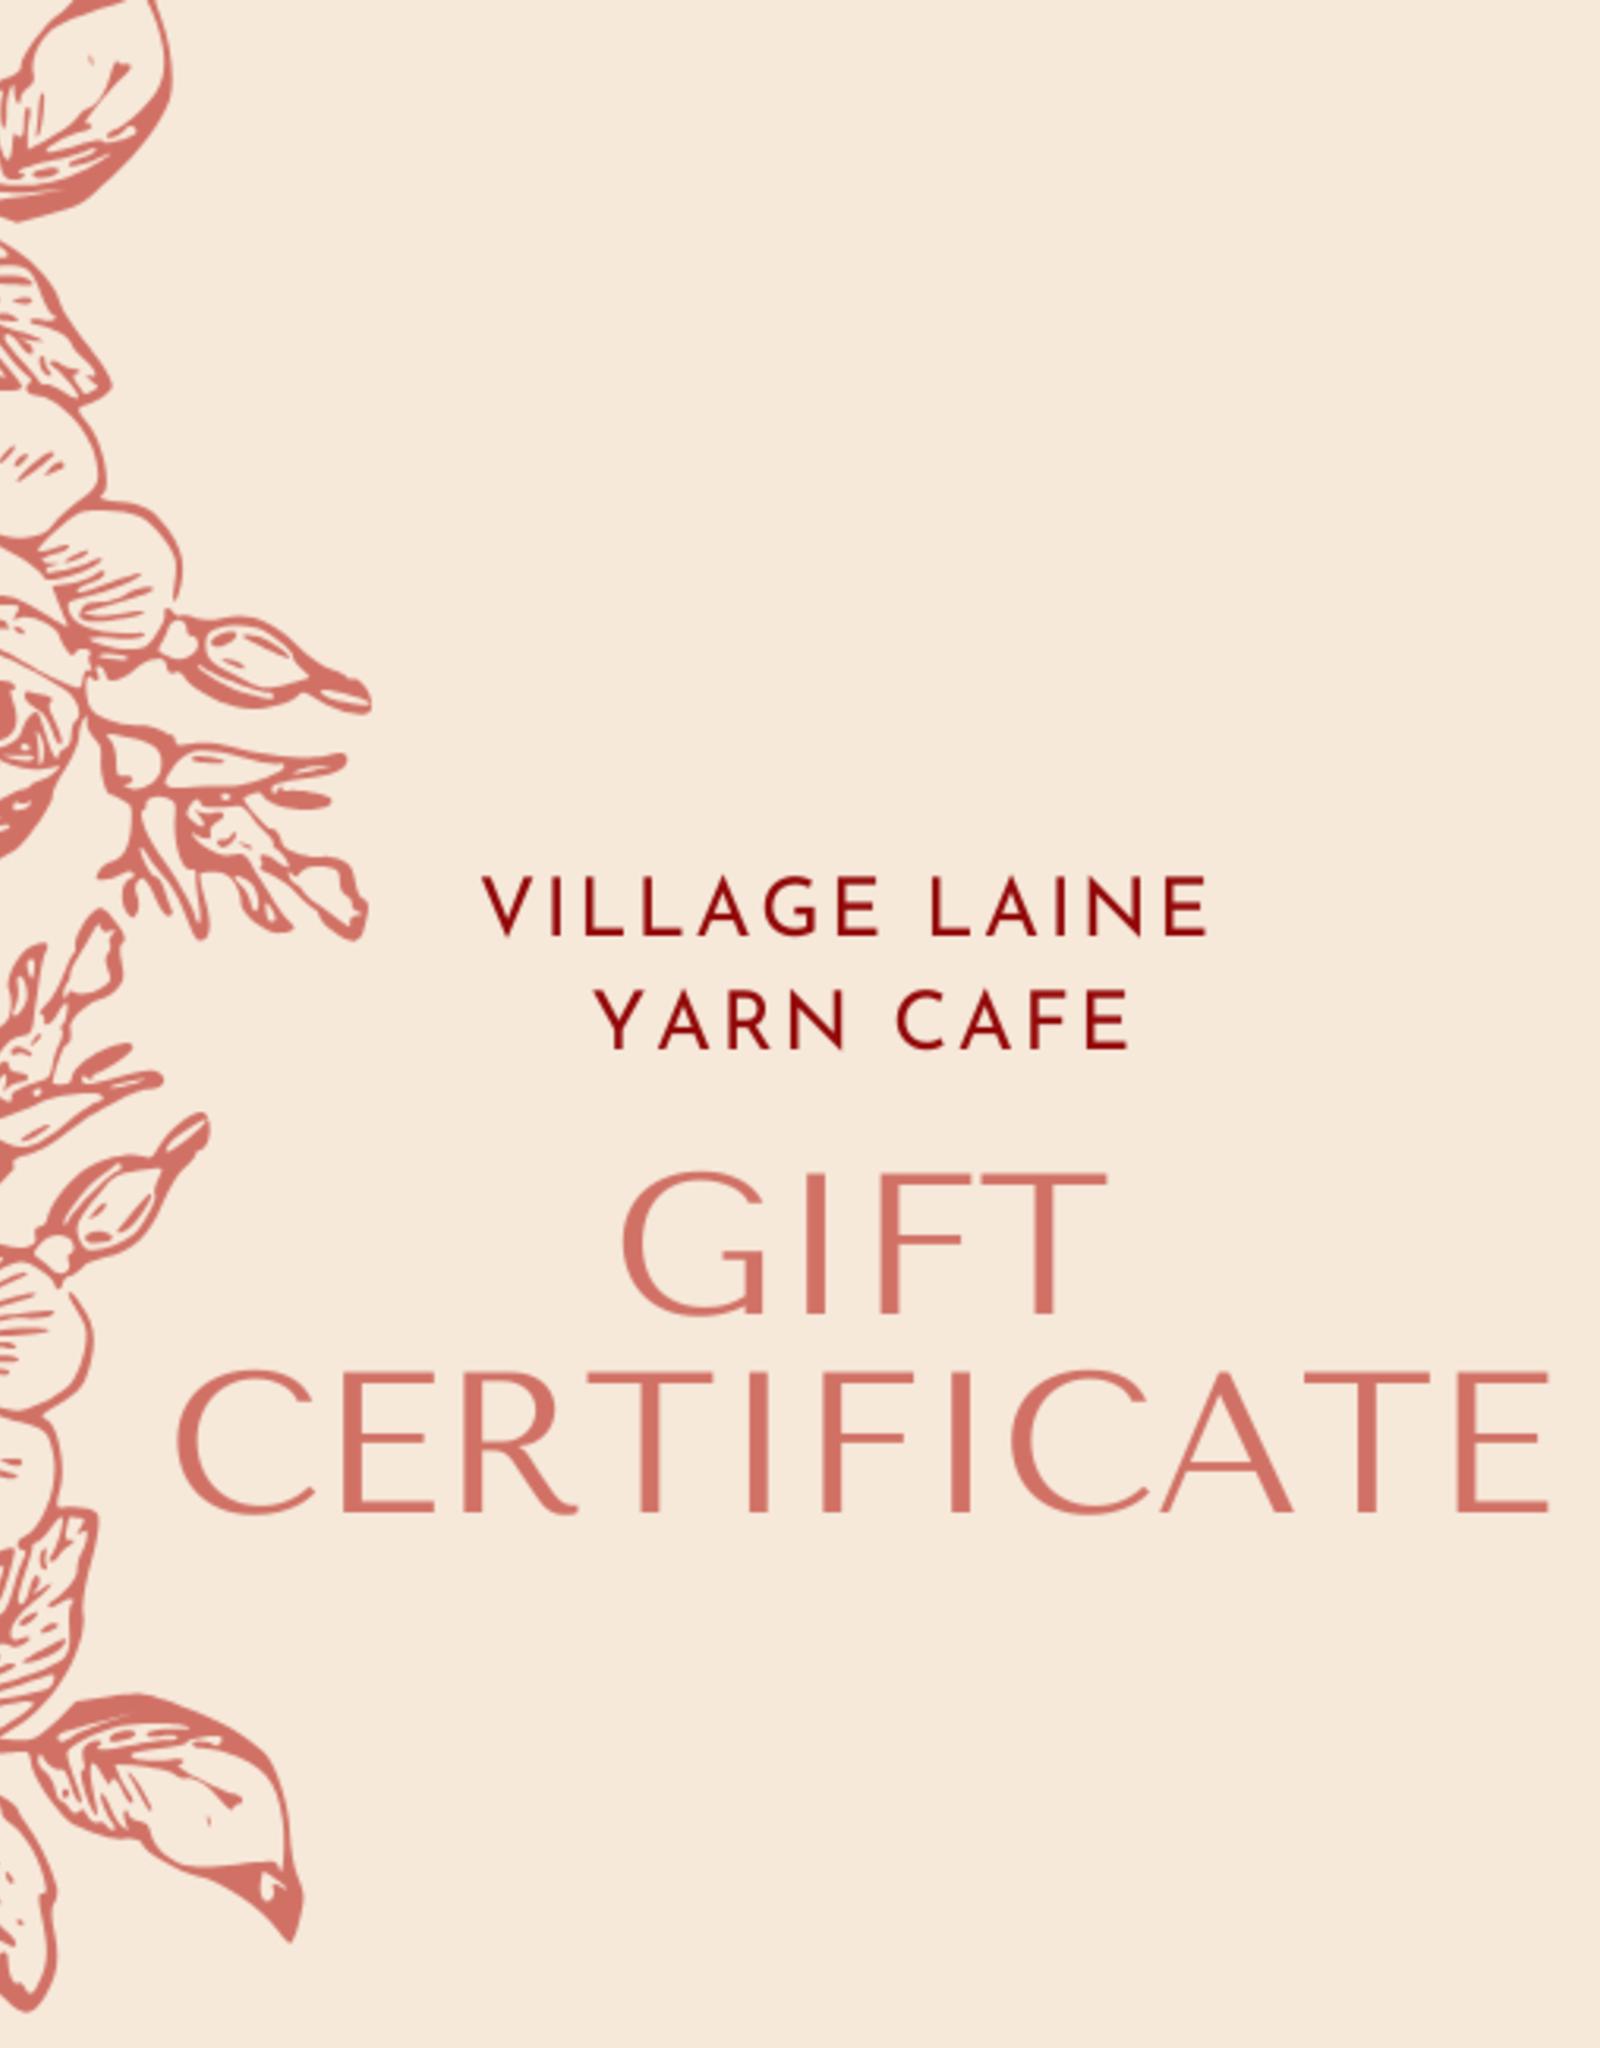 Village Laine Gift Certificate $50